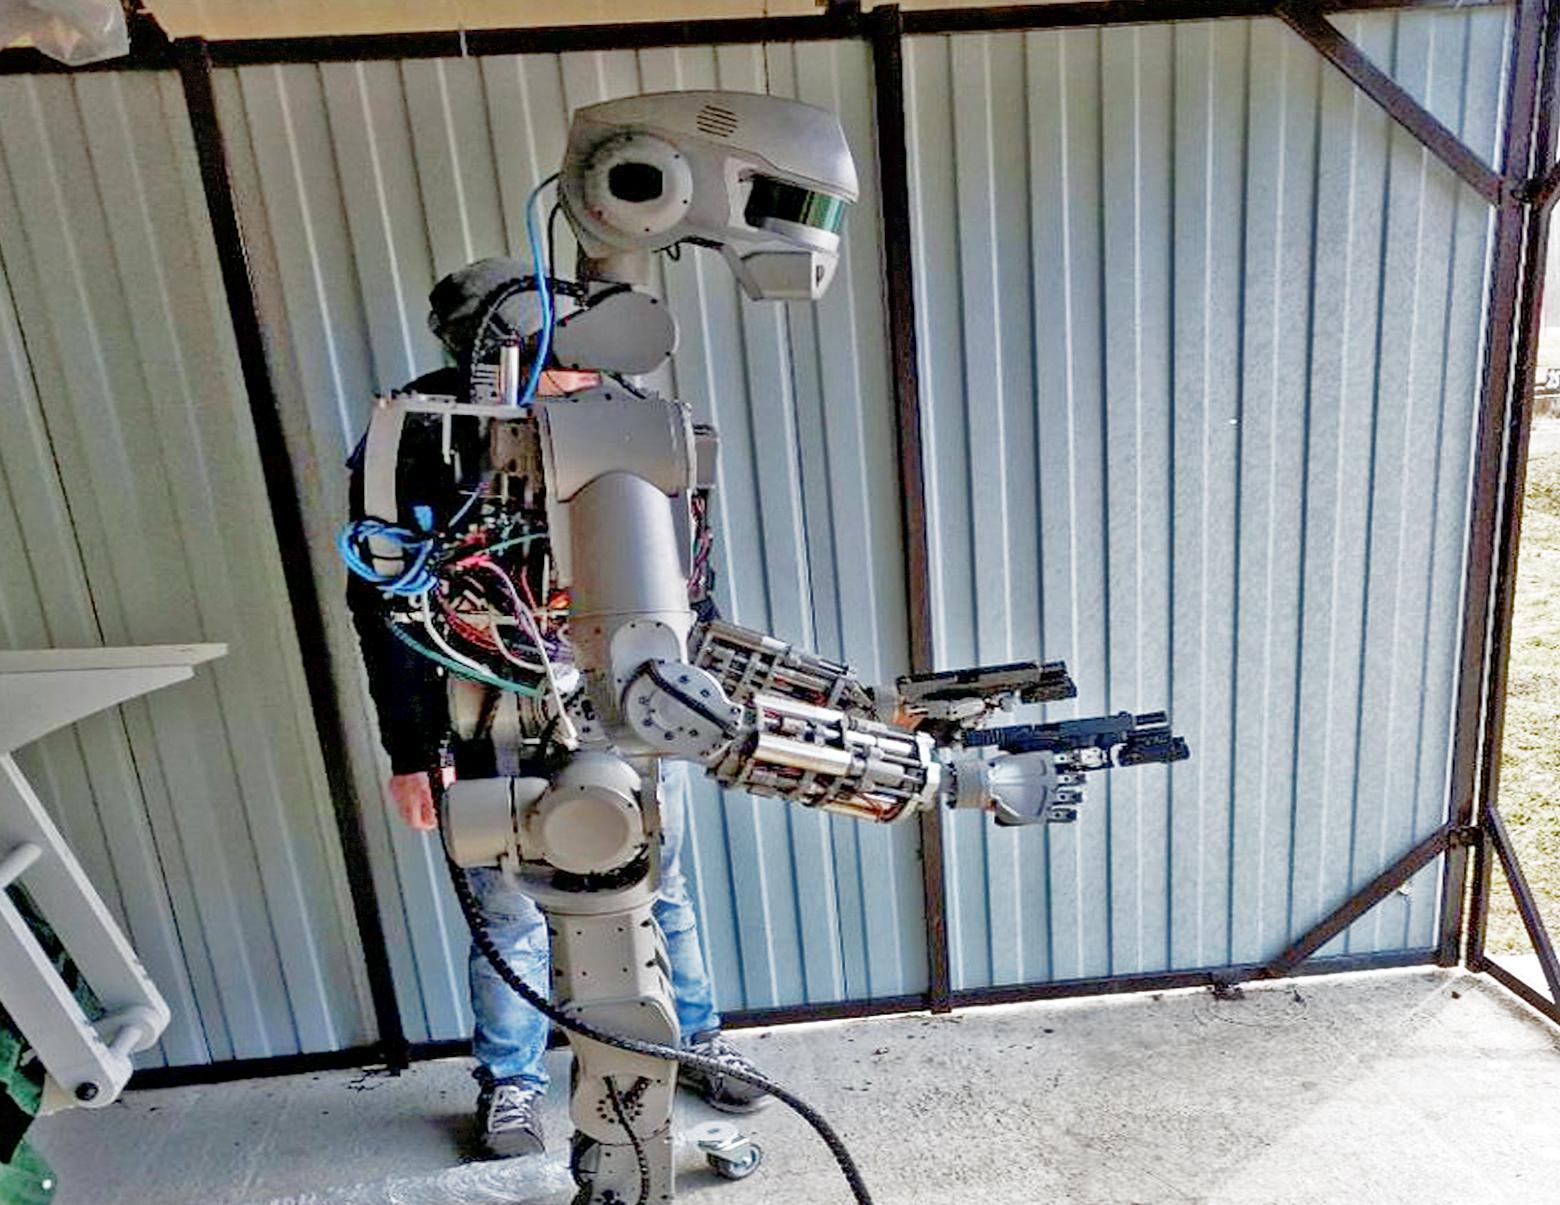 russian terminator robot